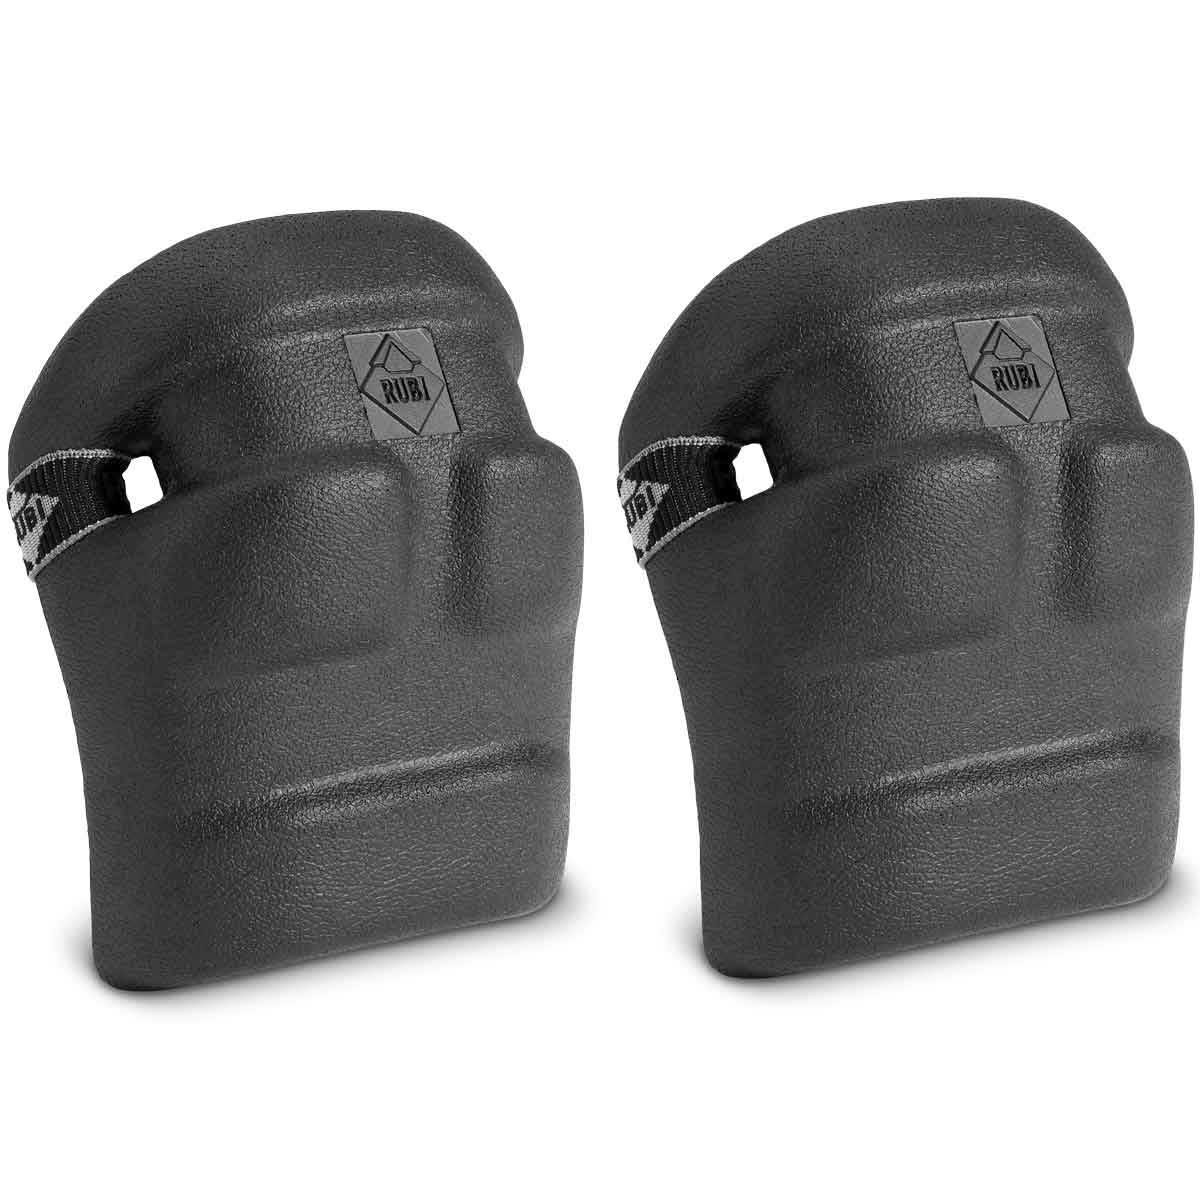 Rubi SR1 Ergonomic knee pad appart